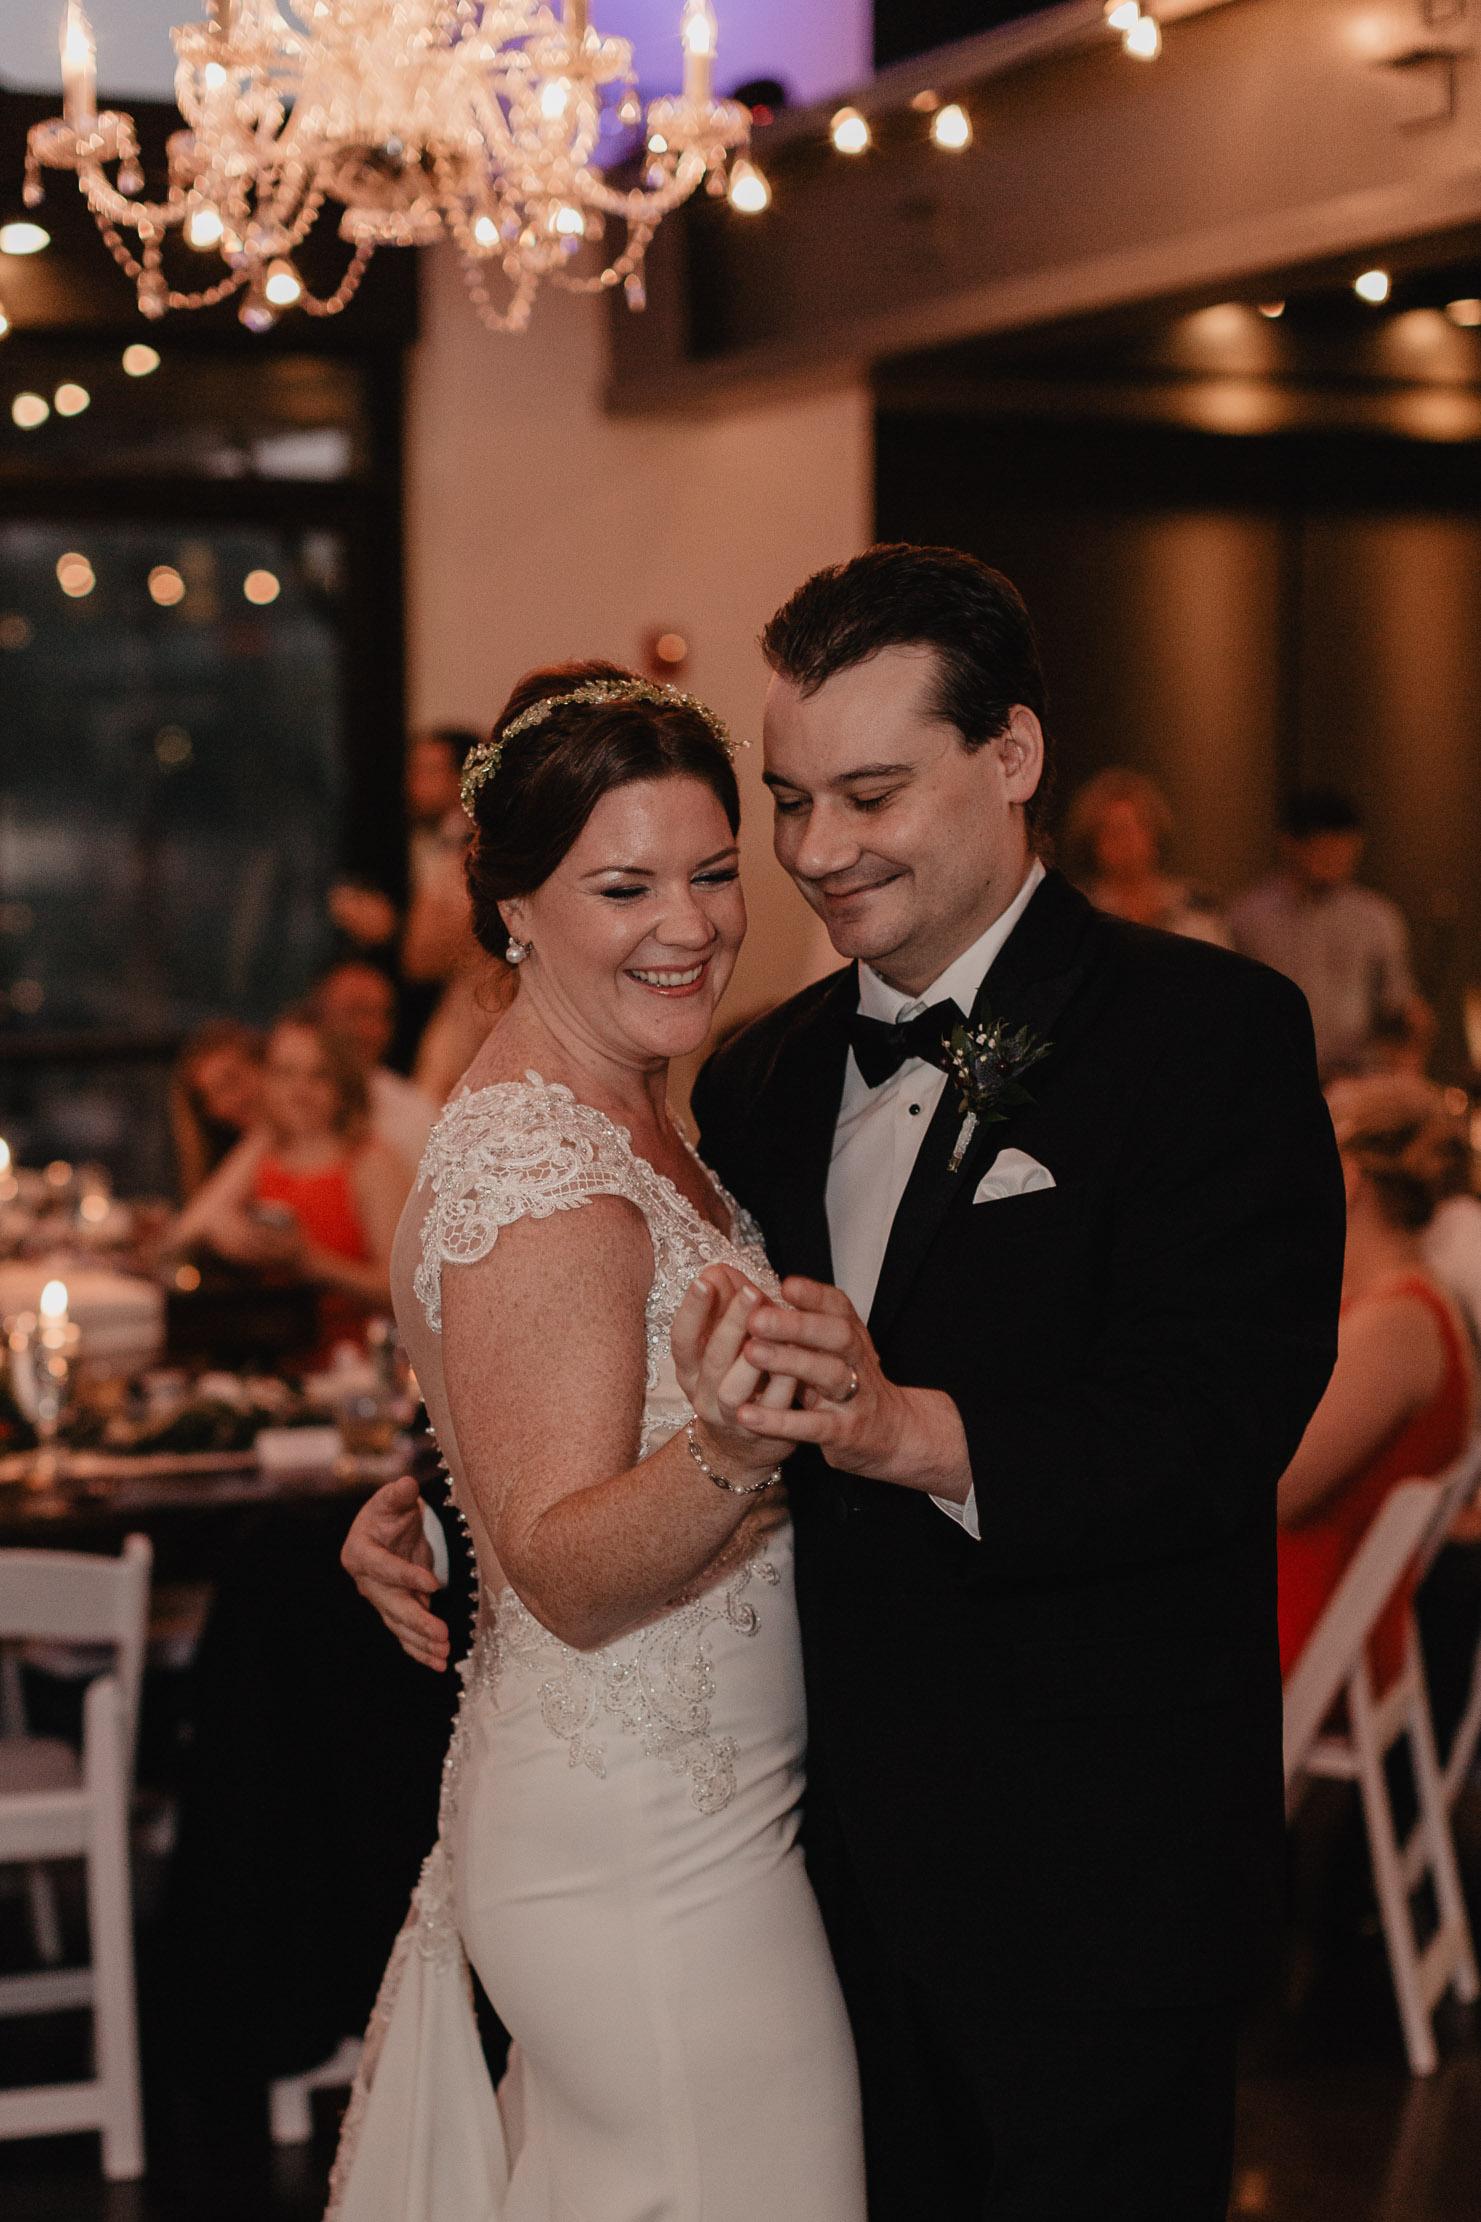 The Bridge Building | Nashville Wedding Photographer